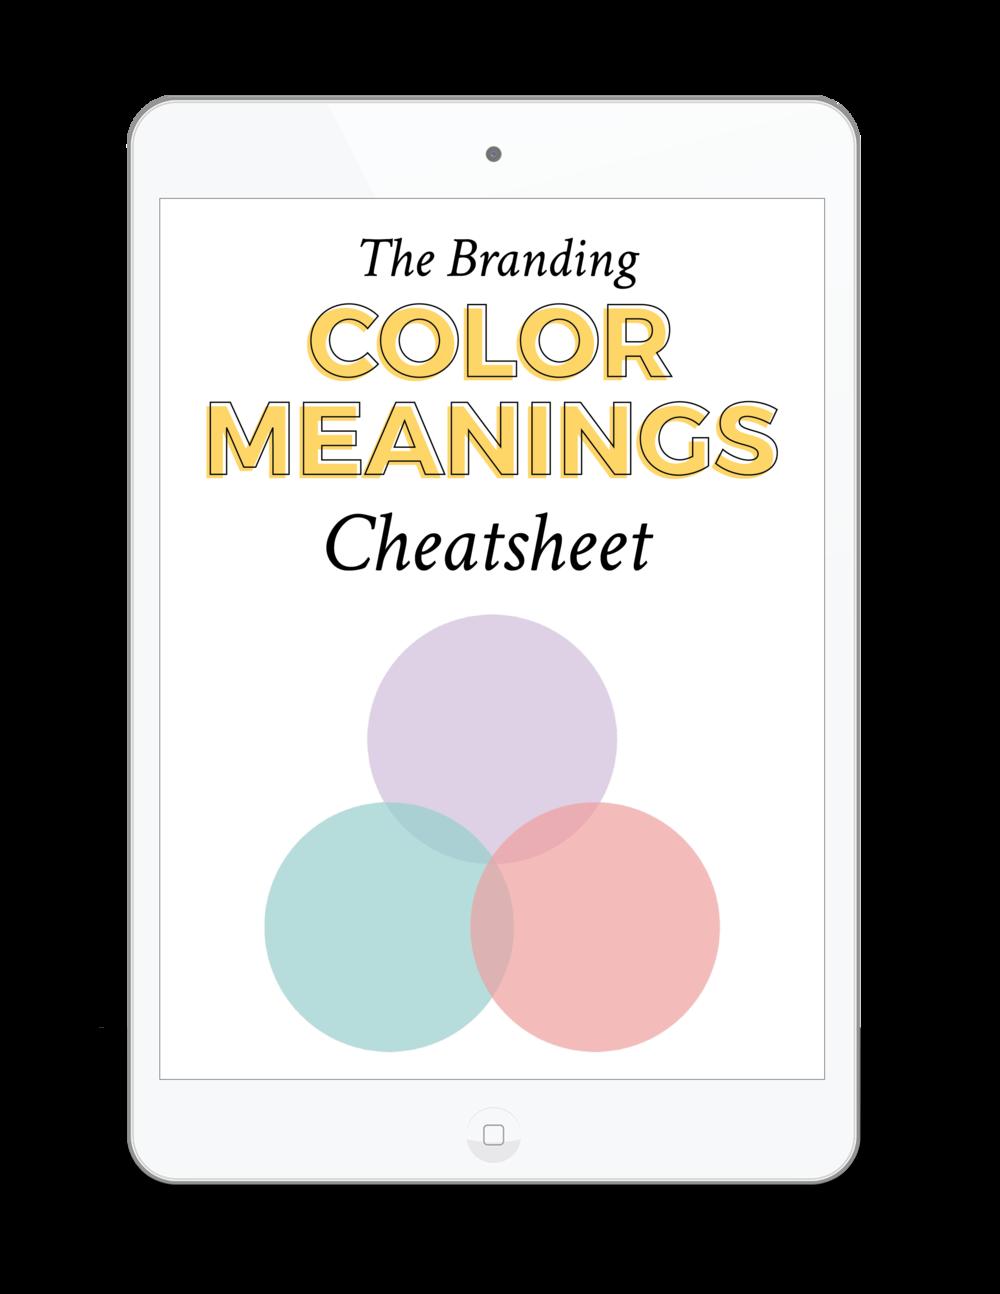 The Branding Color Meanings Cheatsheet -